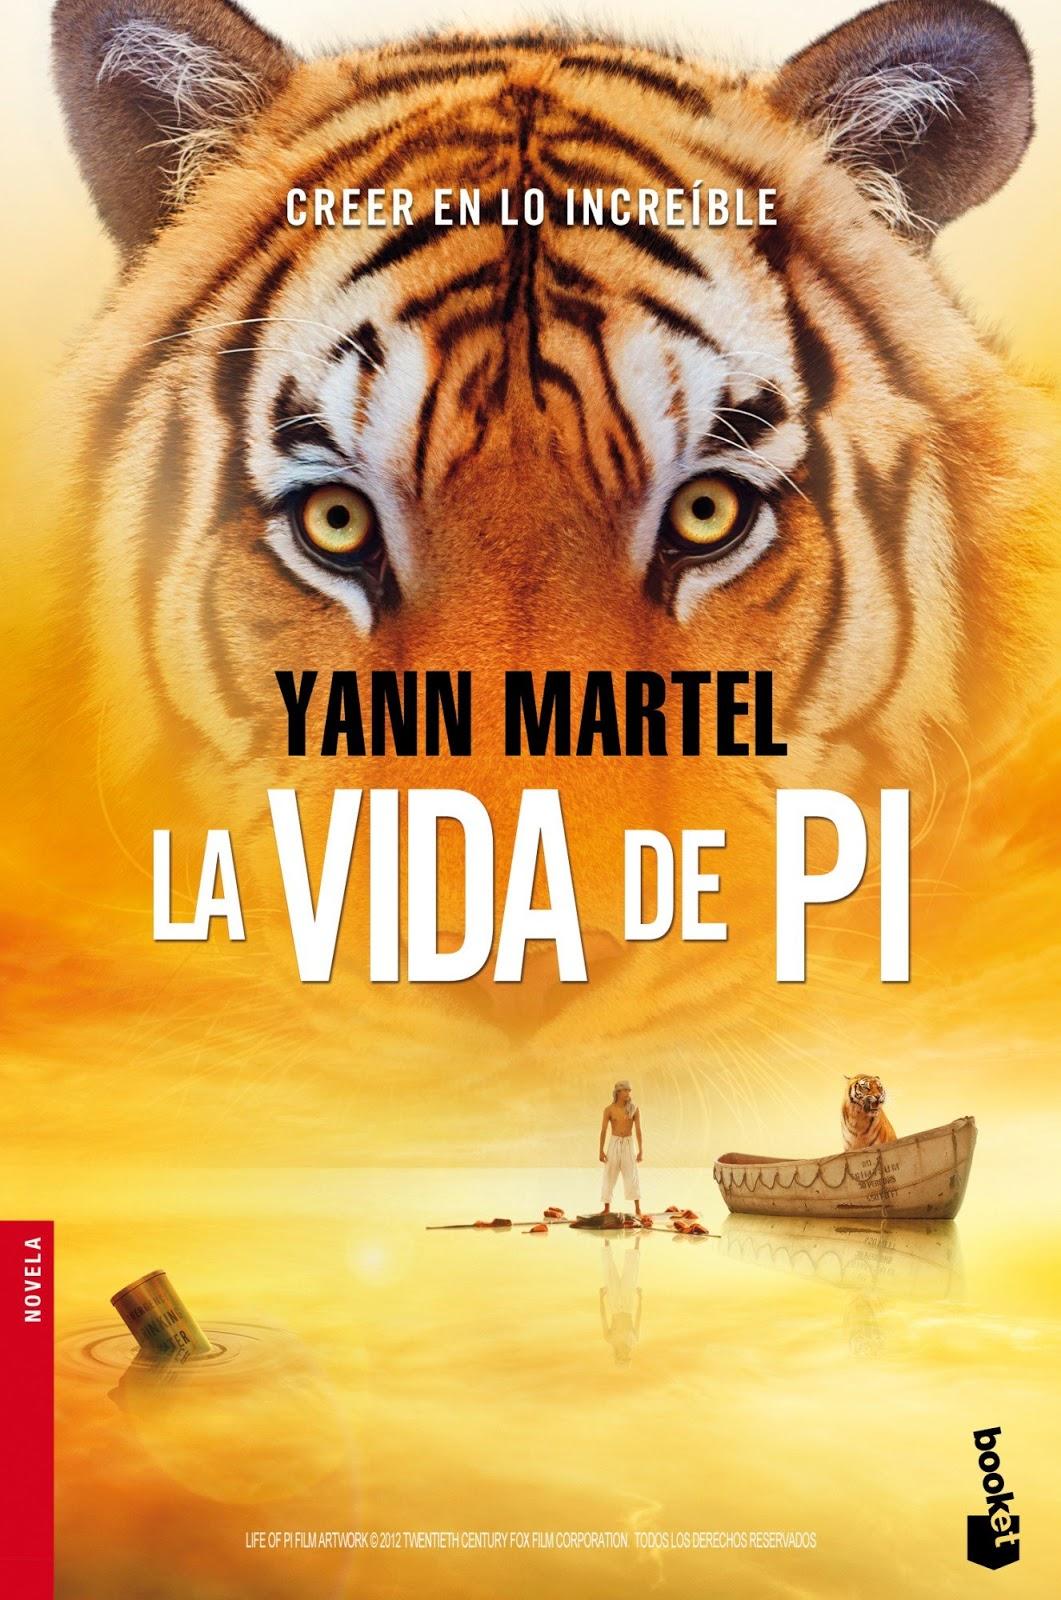 http://labibliotecadebella.blogspot.com.es/2017/04/la-vida-de-pi-yann-martel.html